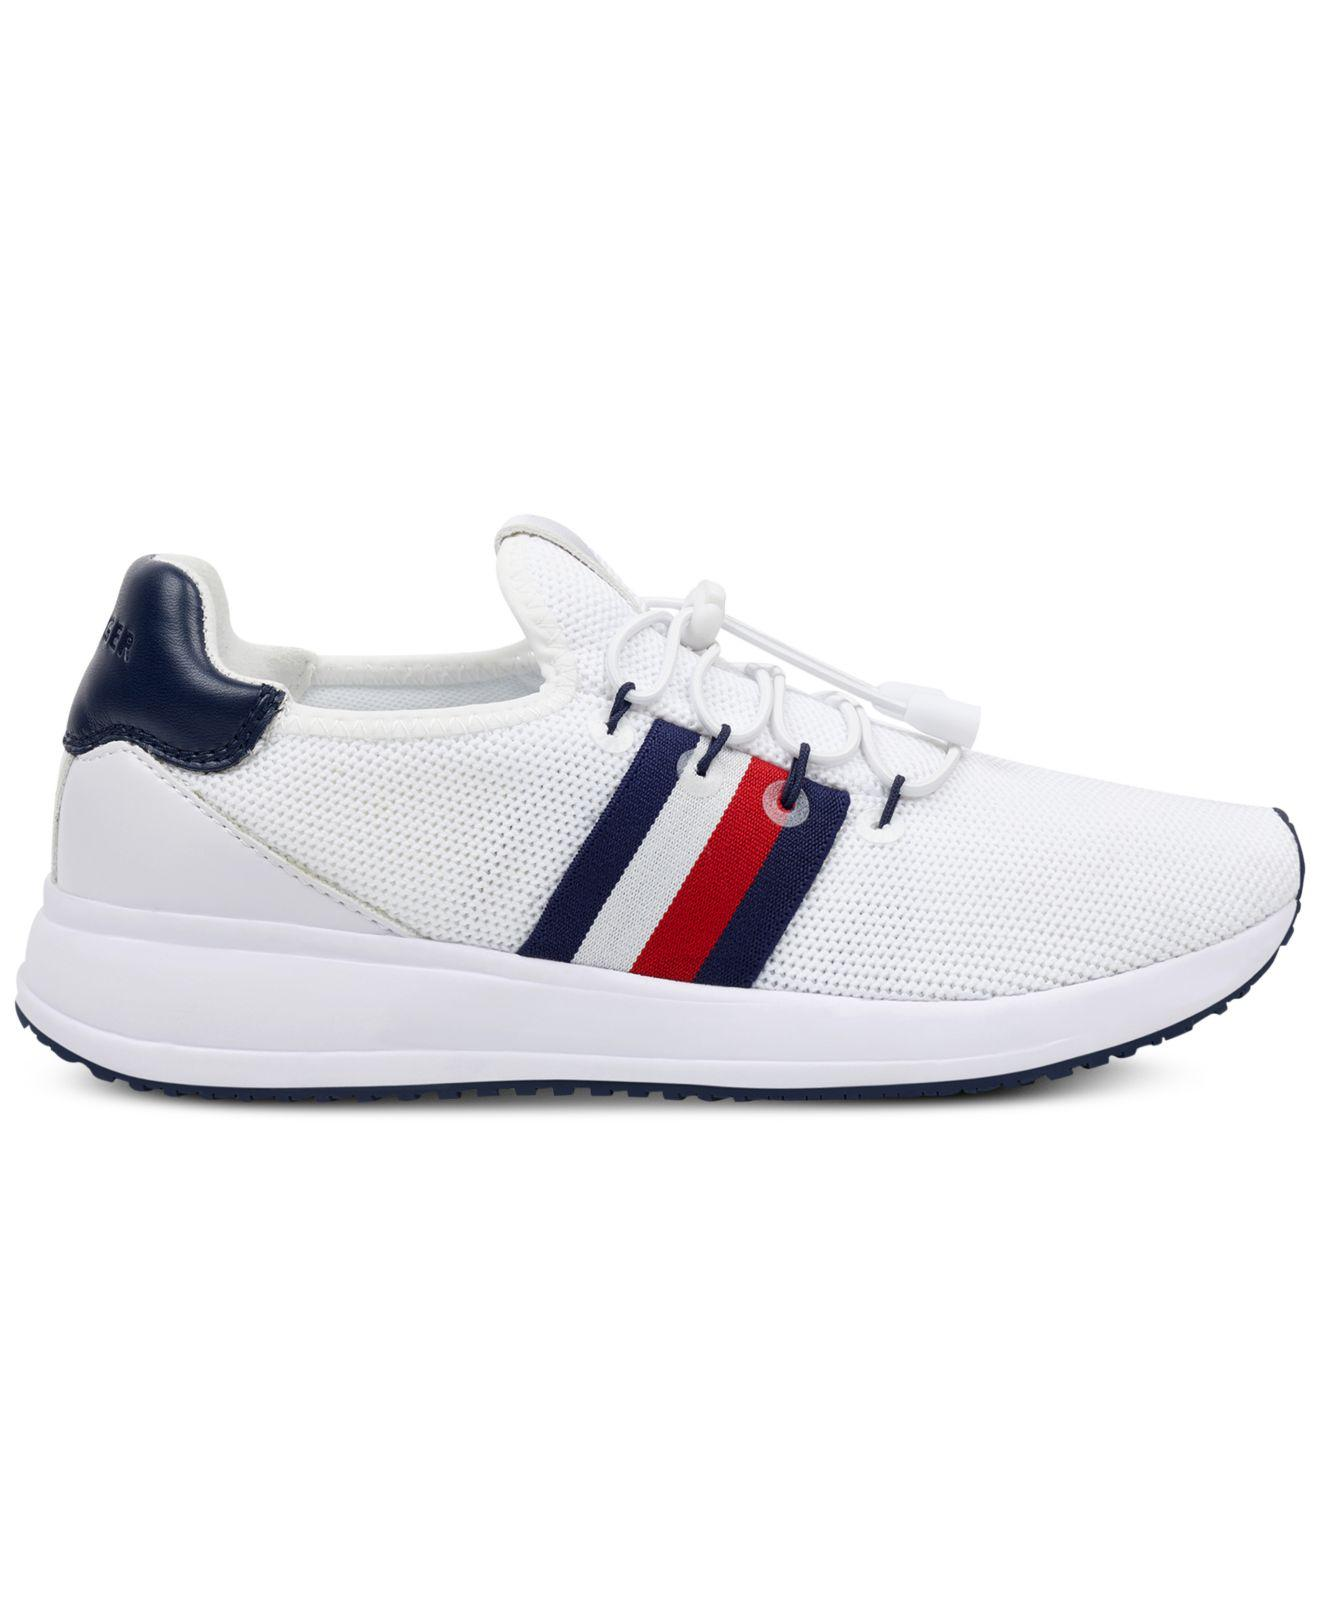 b19135ffd47e6b Lyst - Tommy Hilfiger Rhena Sneakers in White